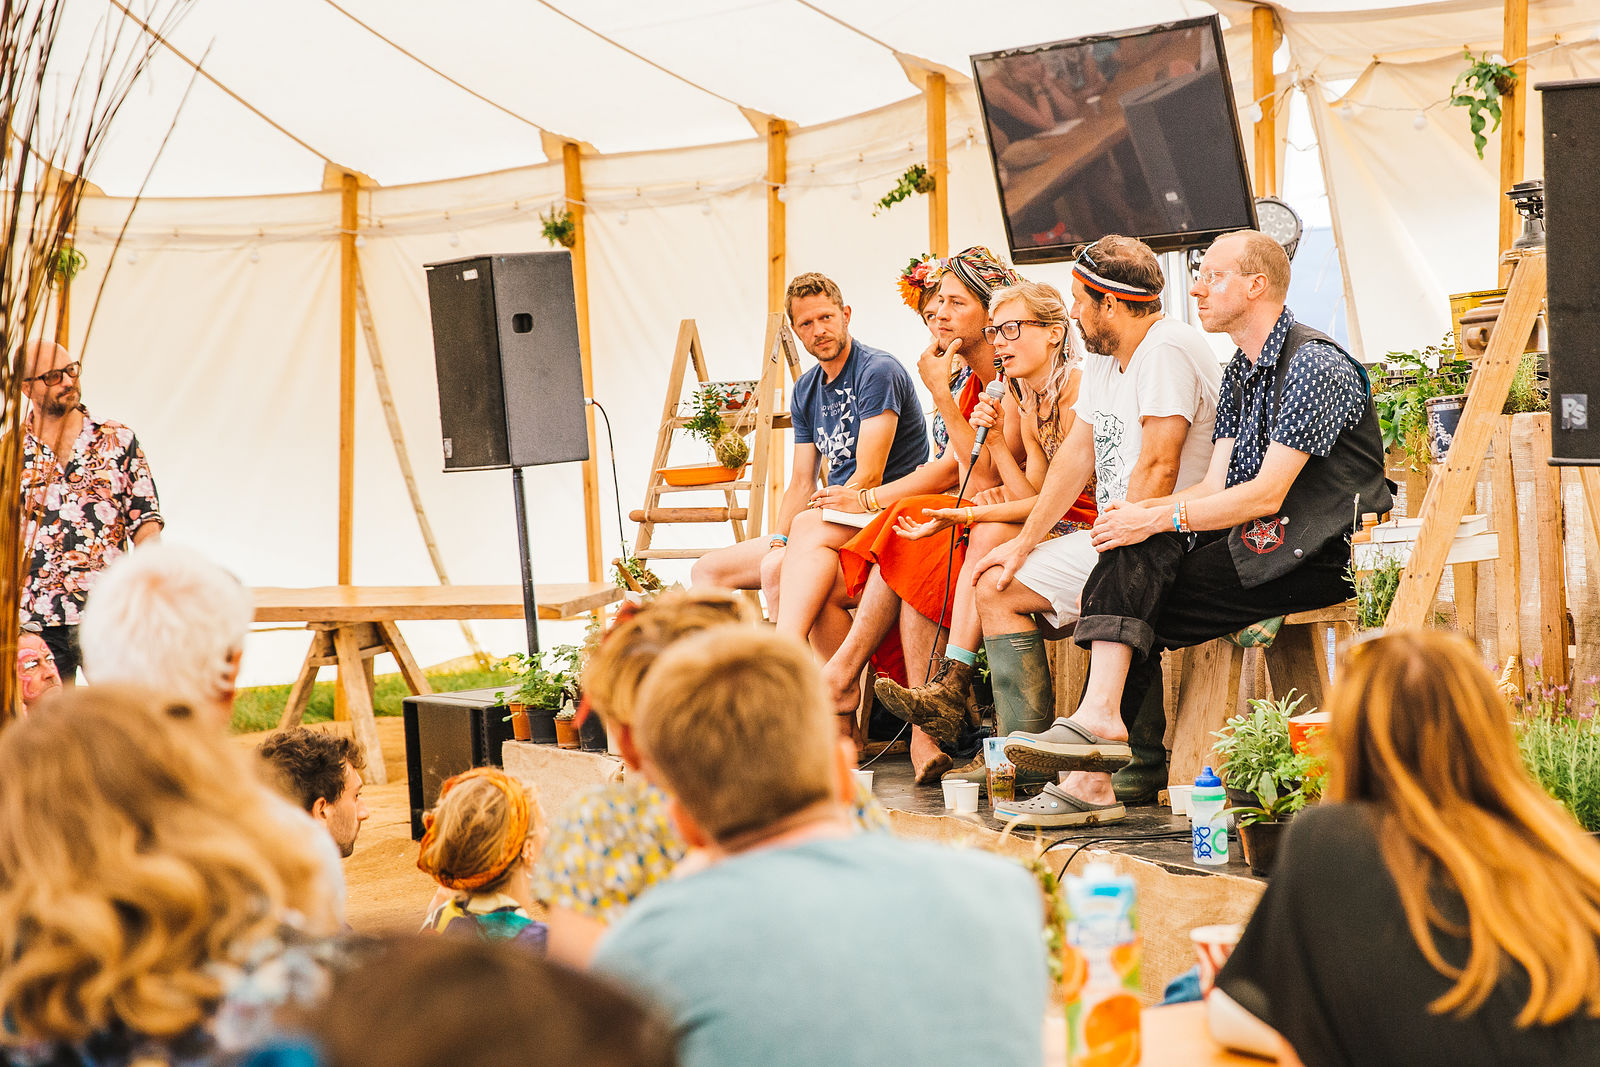 The Great Garden O'Feeden Food Debate